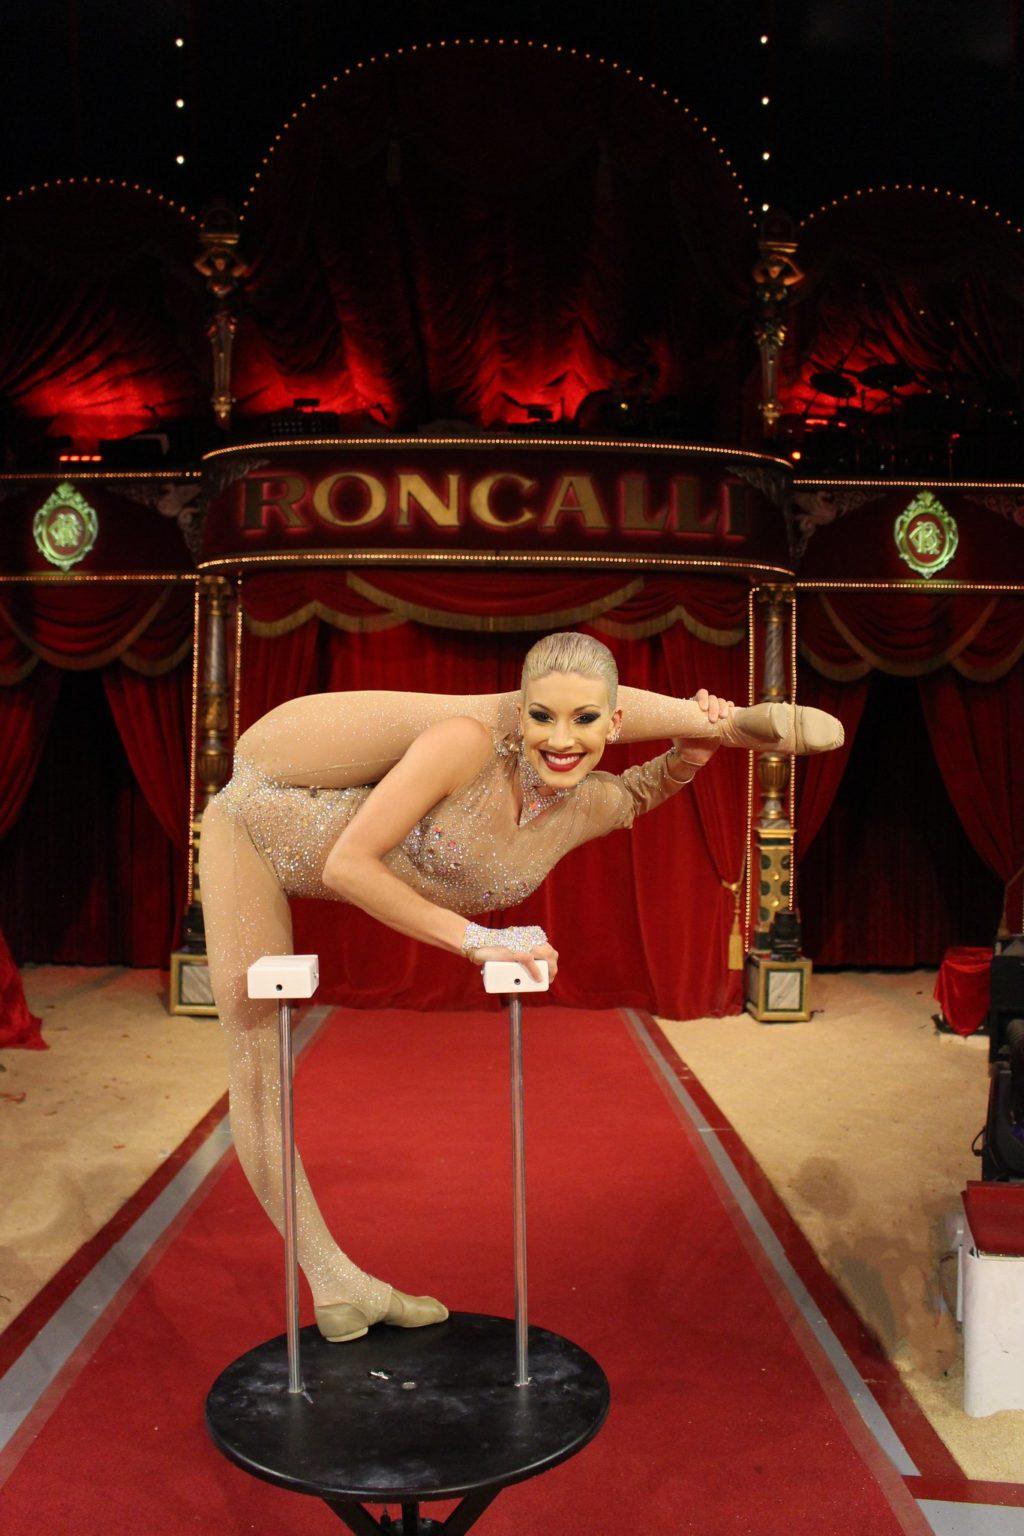 cirkus, ? Circus Theater Roncalli vom 7. Juni – 14. Juni 2019 auf der Moorweide in Hamburg, City-News.de, City-News.de